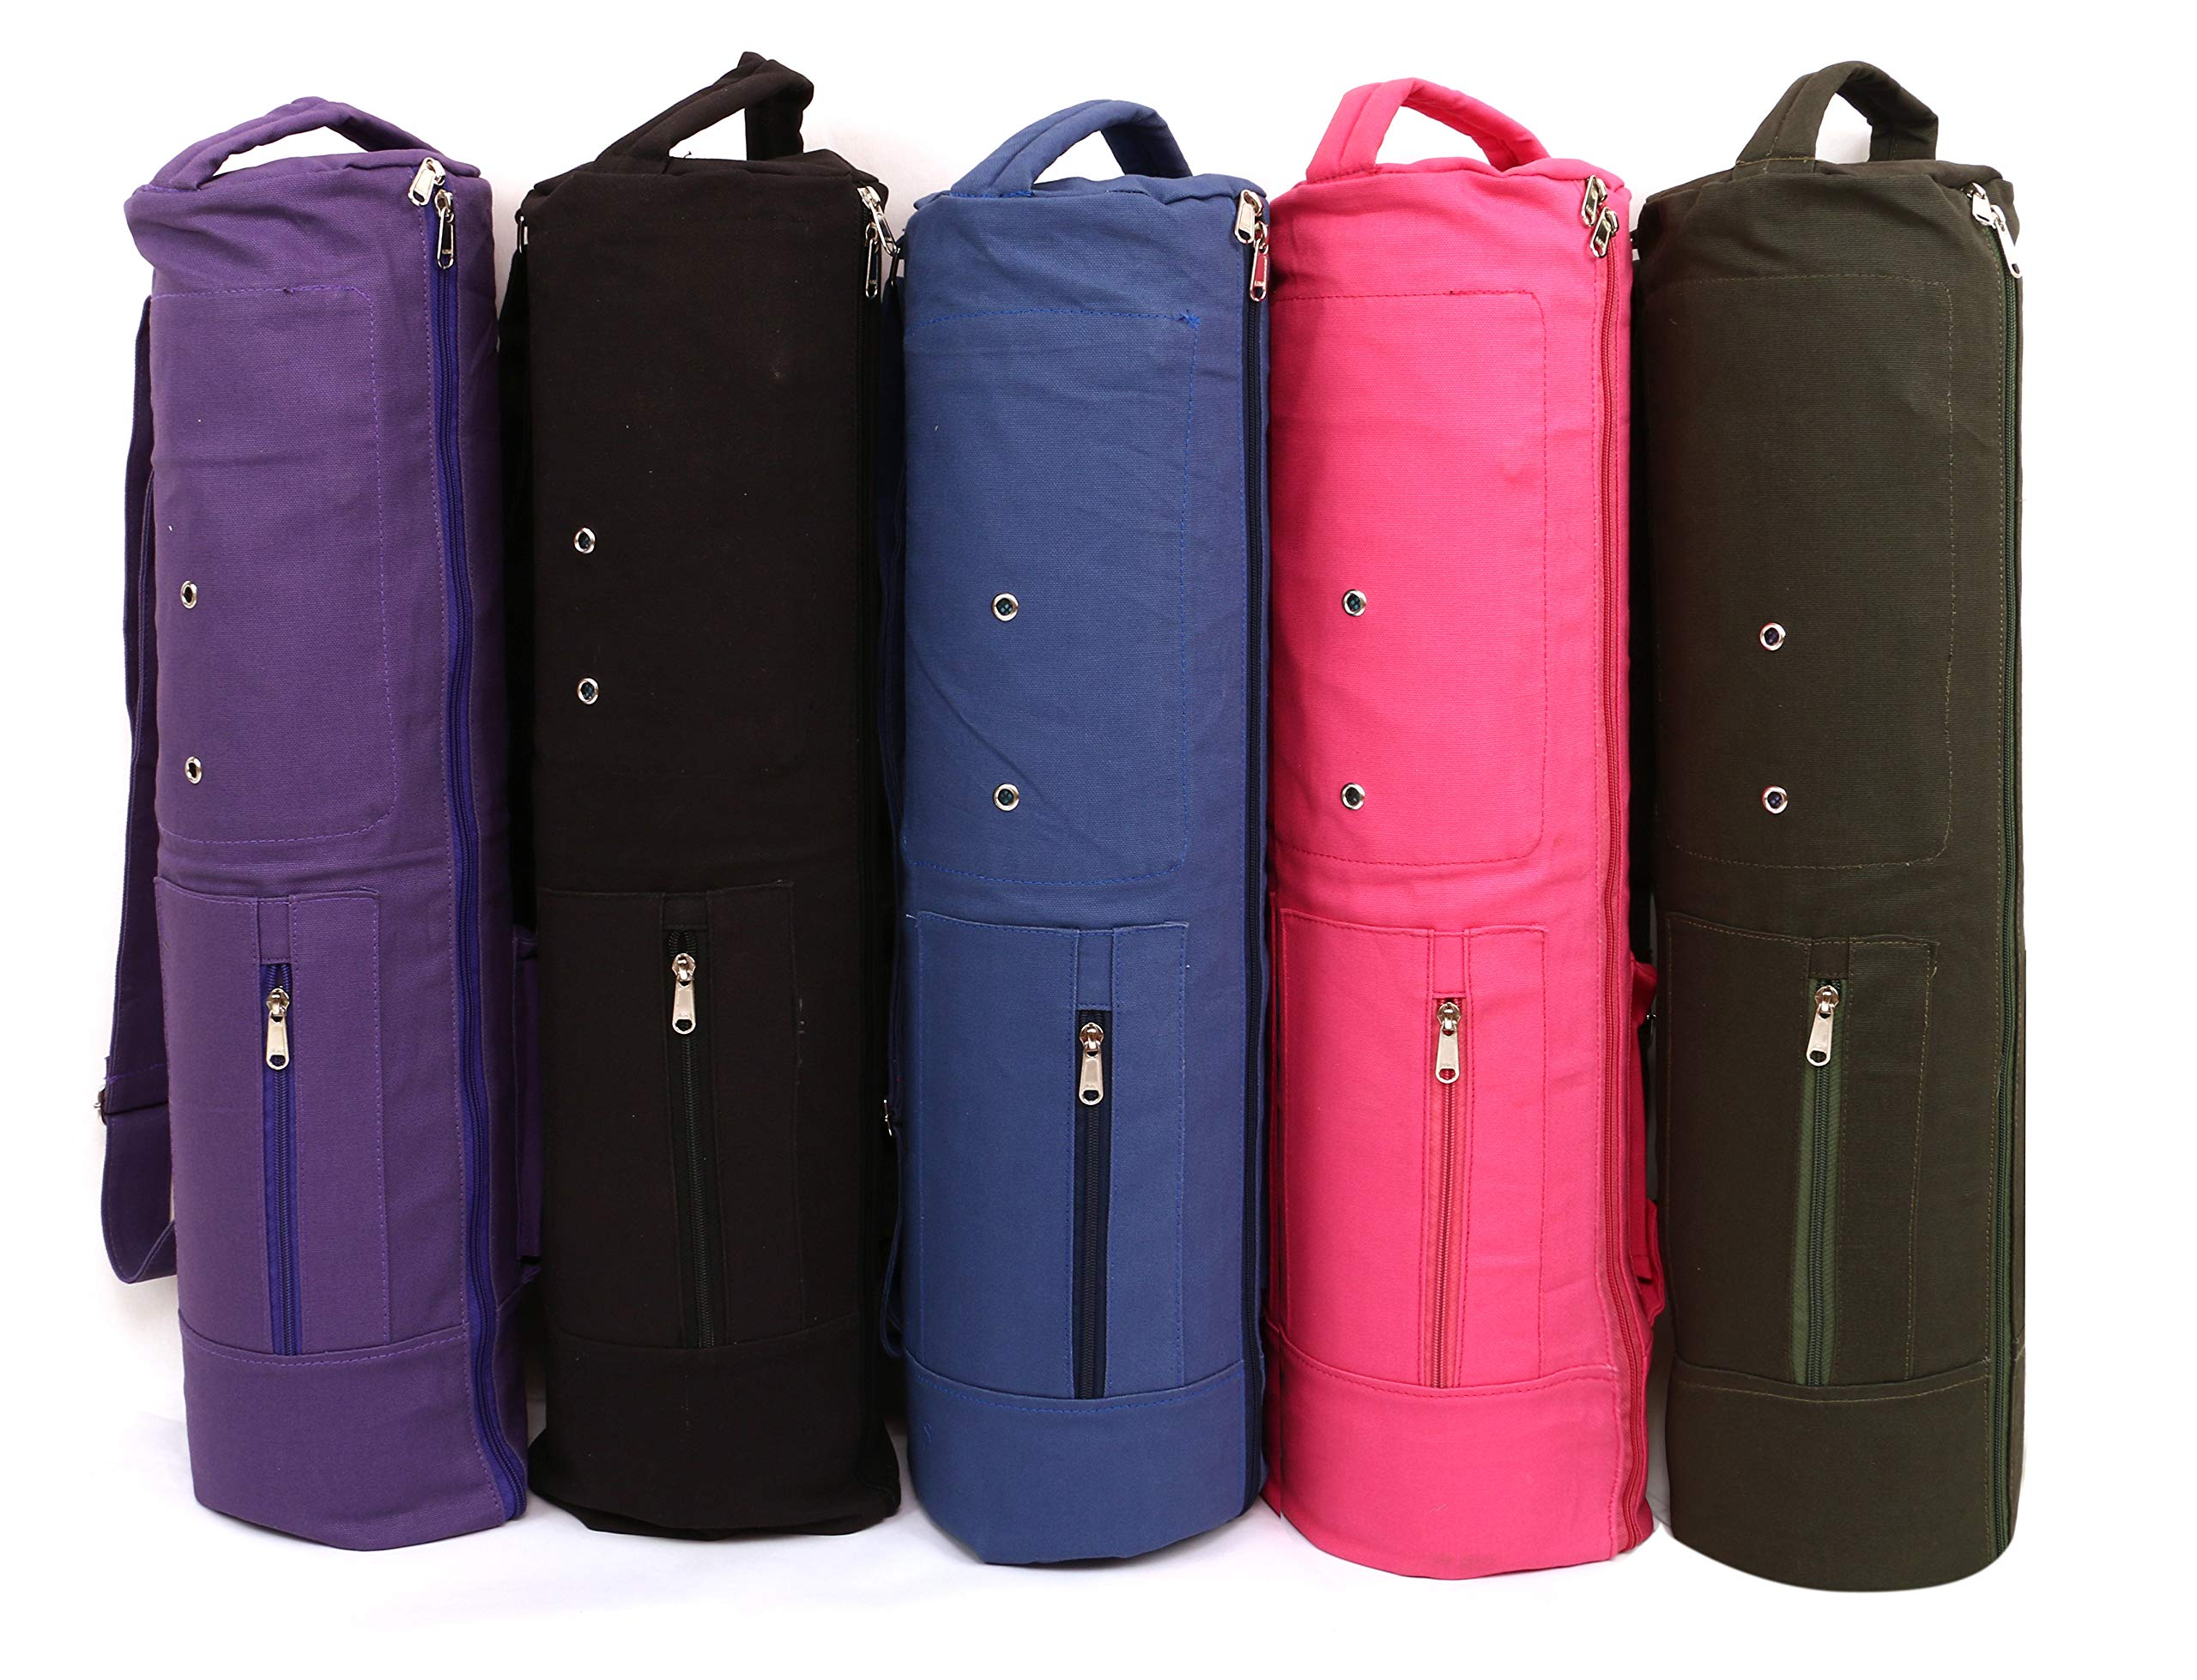 KD Yoga Mat Bag Cover Full Zip Large Size Double Storage Fits Yoga Mat, Block, Belt & More 3 Pockets(Black, Duble Storage)